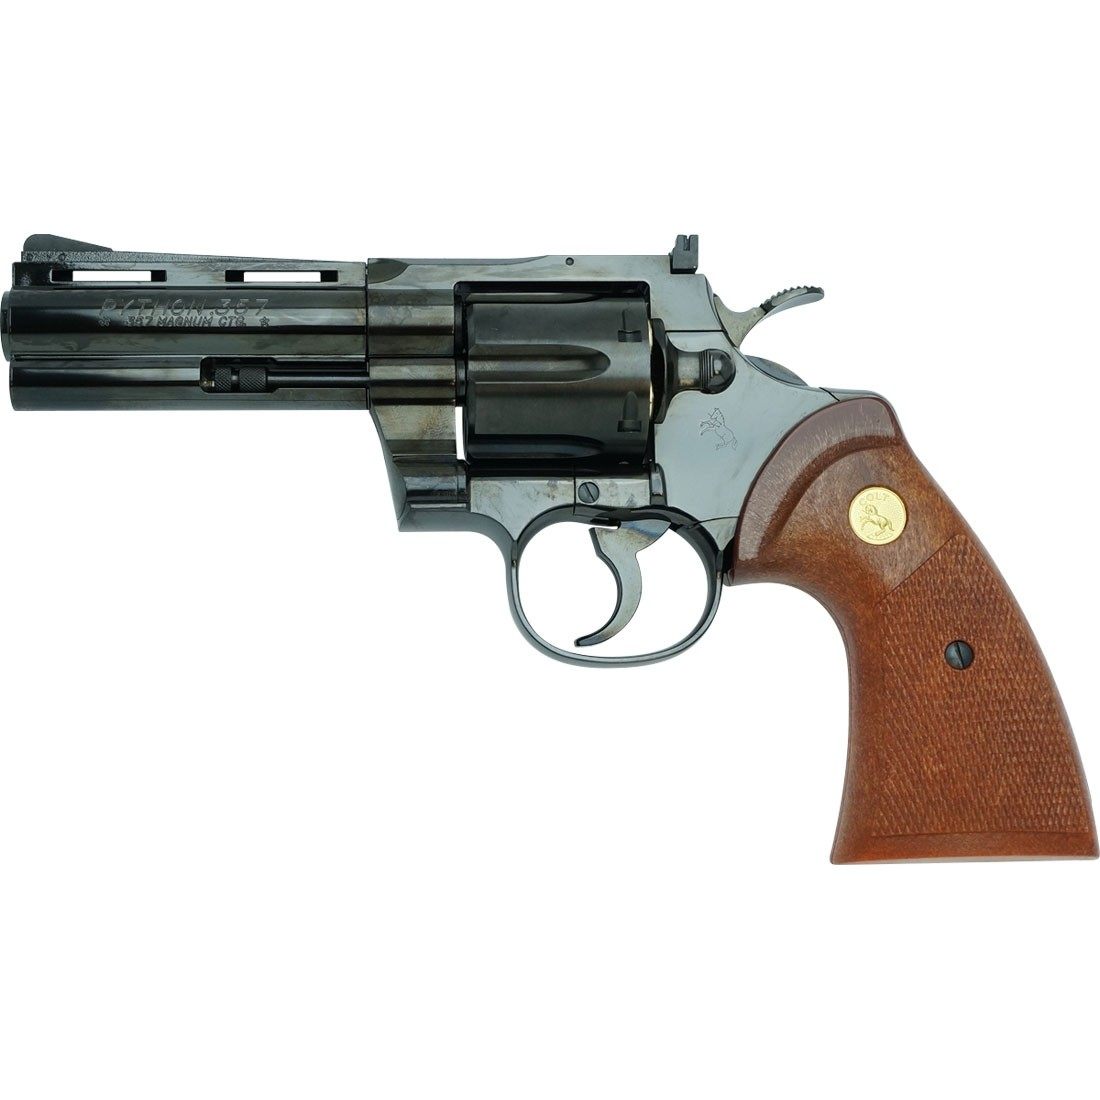 "Tanaka Colt Python .357 4"" Steel Finish Revolver"